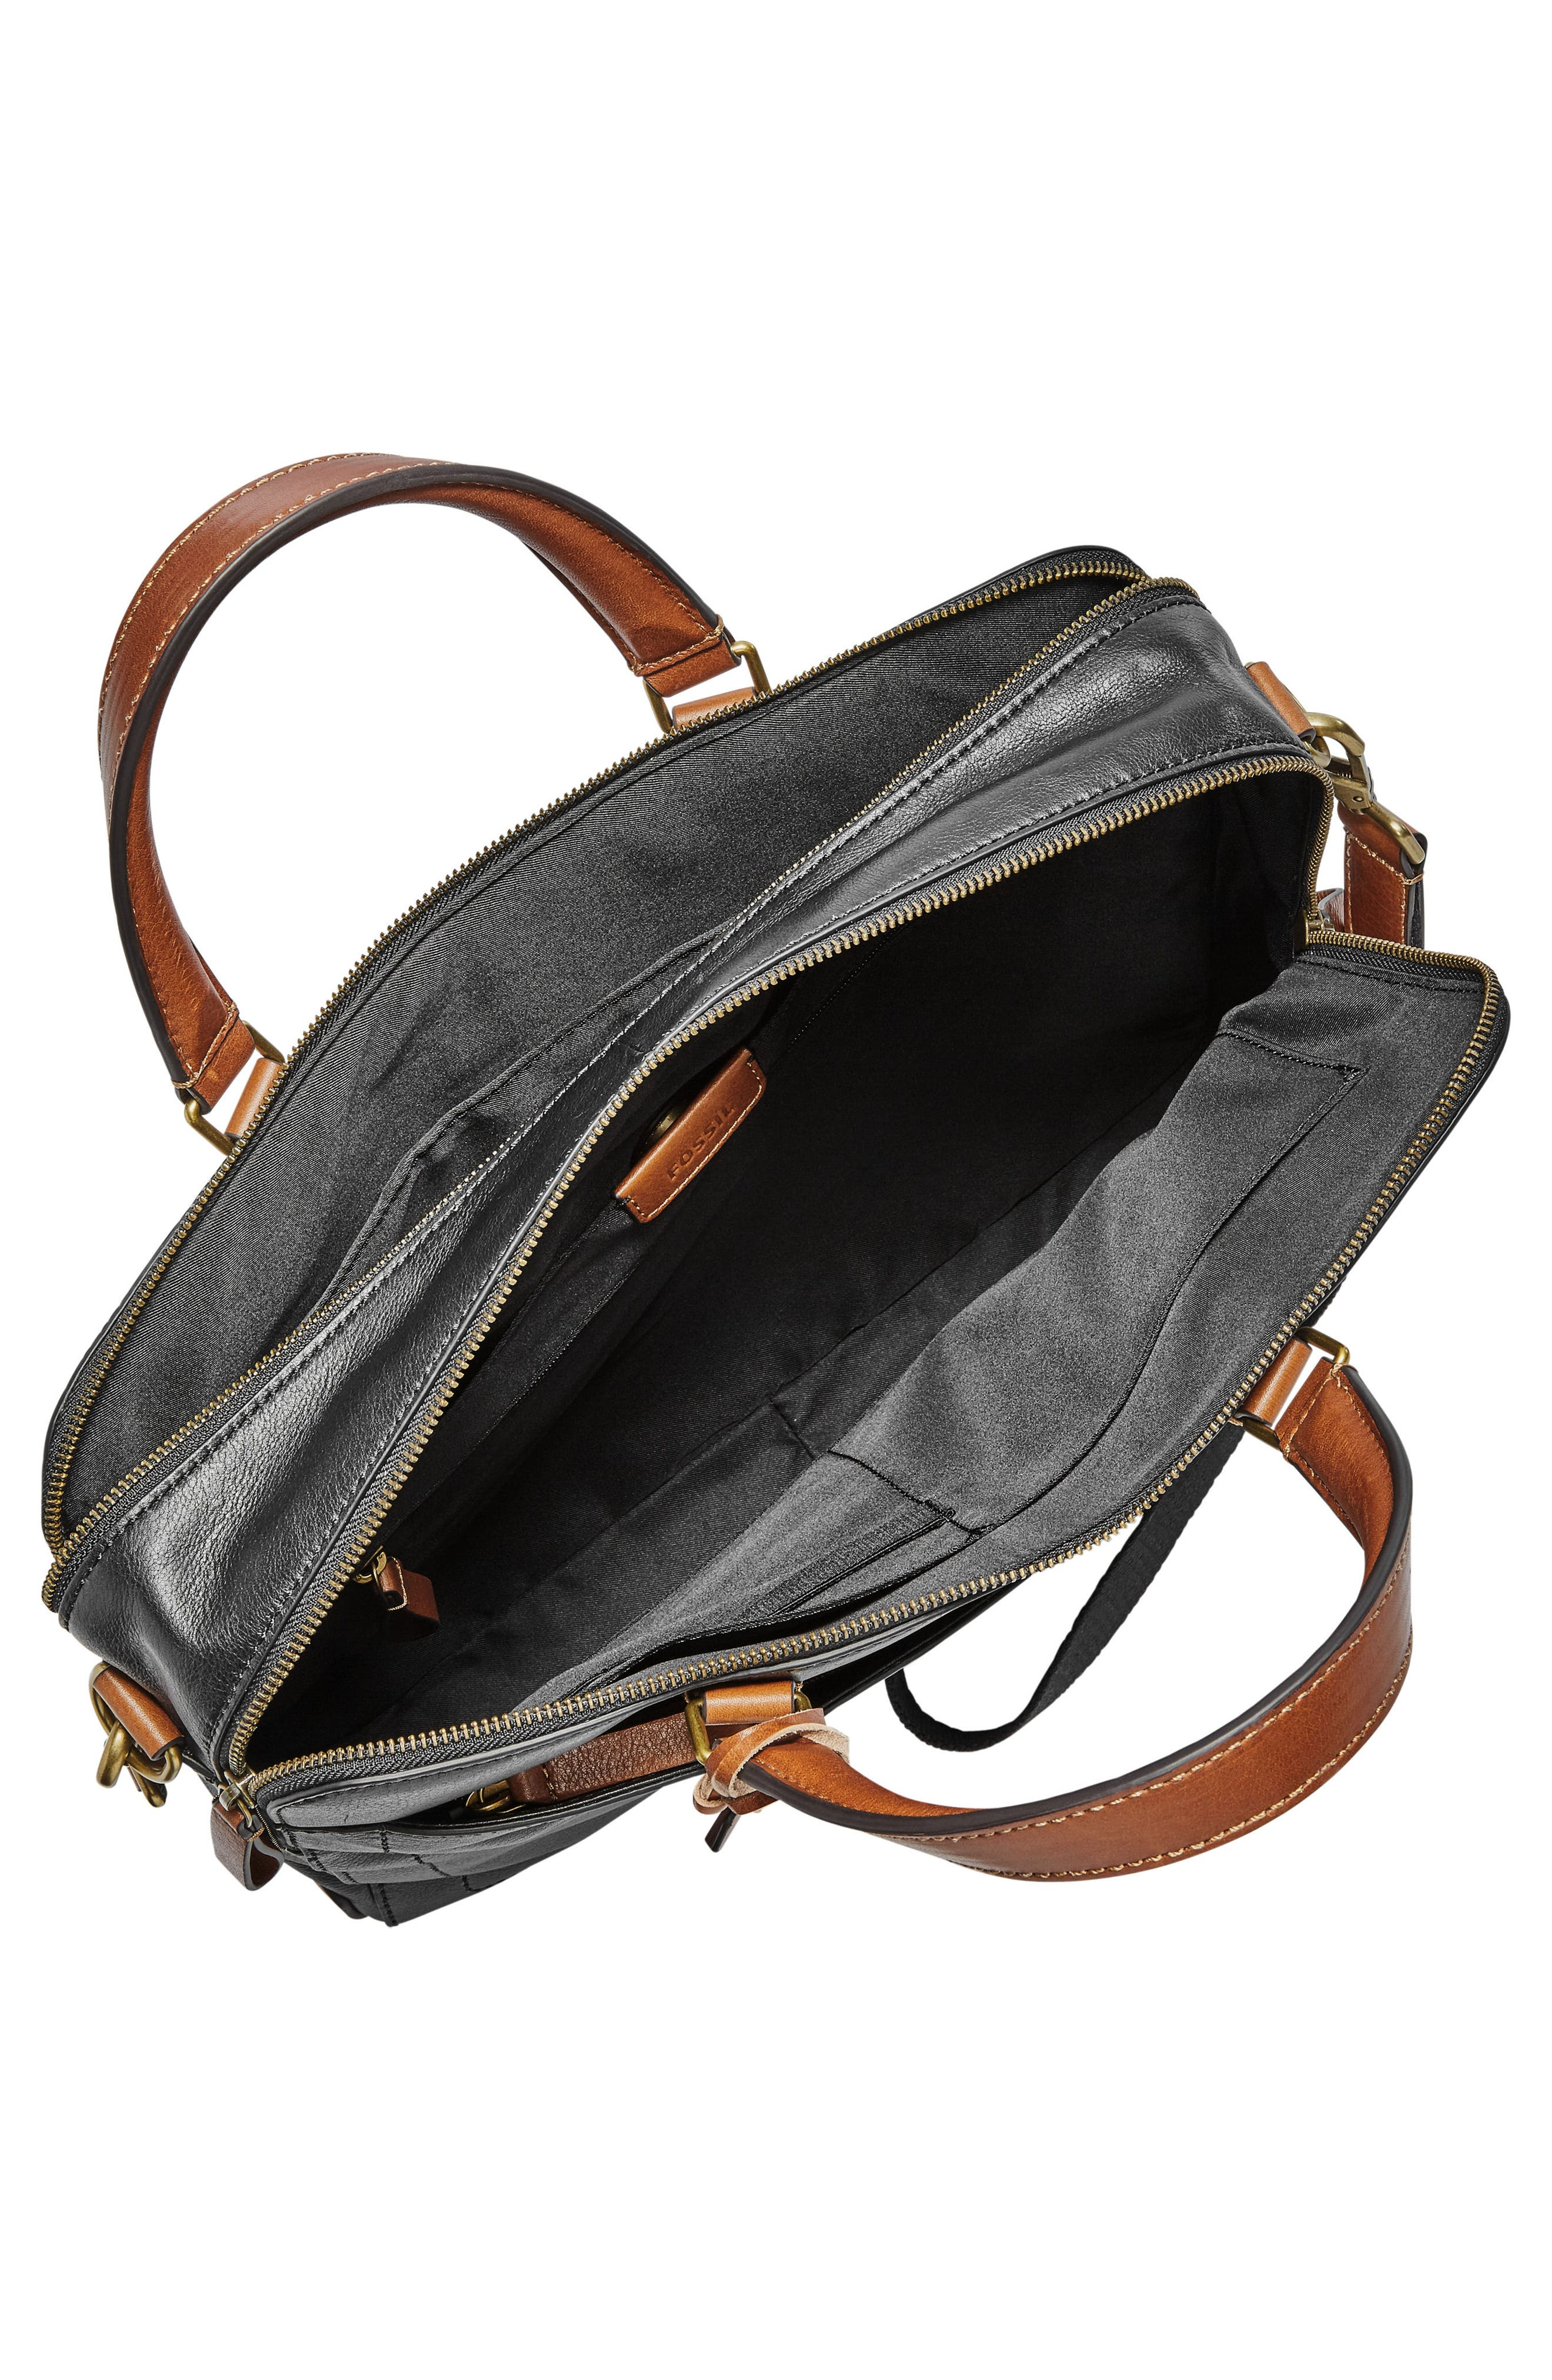 Defender Leather Briefcase,                             Alternate thumbnail 3, color,                             Black